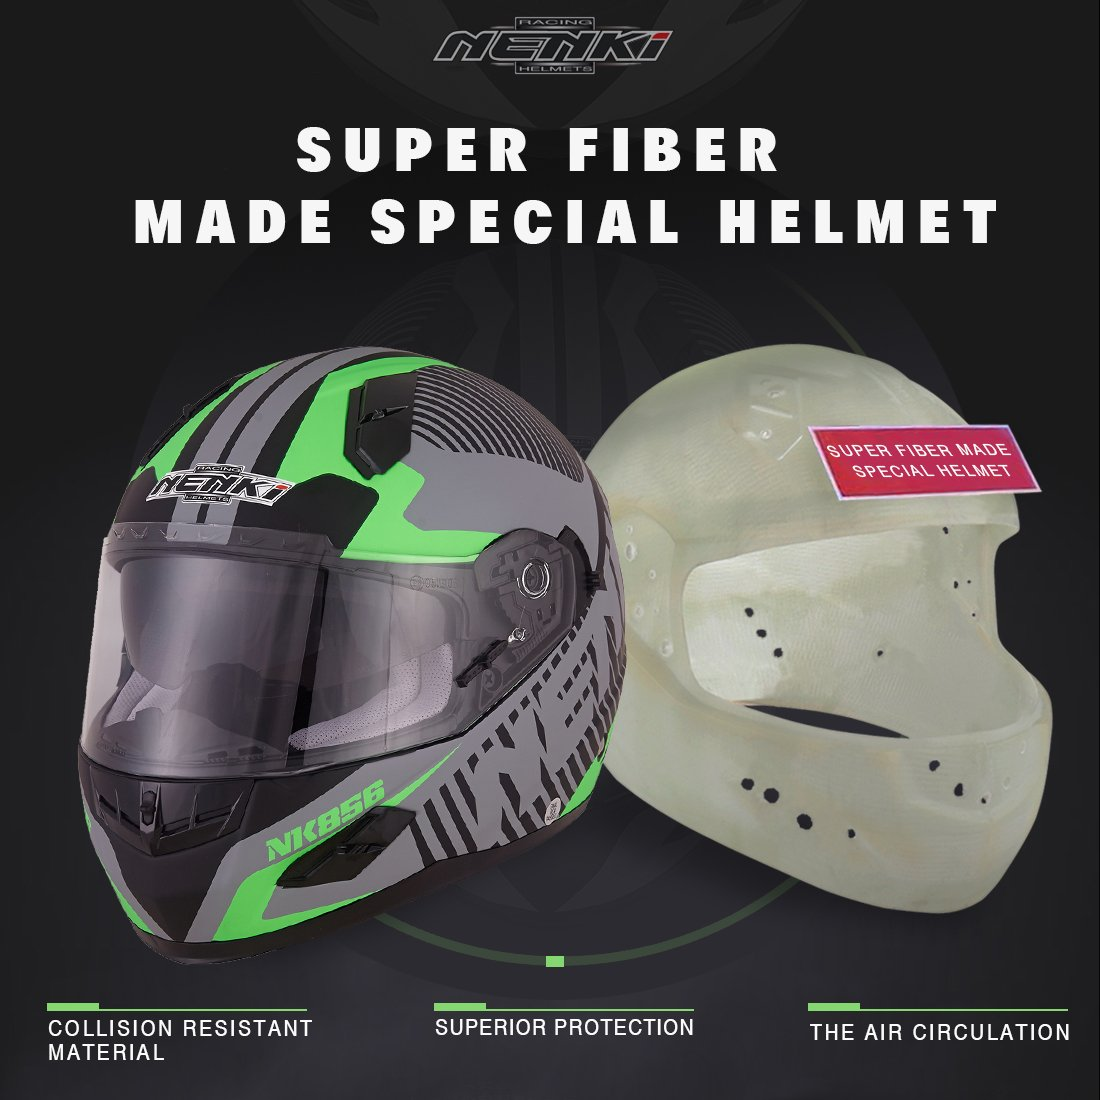 NENKI Helmets NK-856 Full Face Motorcycle Helmets ECE Approved With Dual Visors Large, Matt Black /& Orange